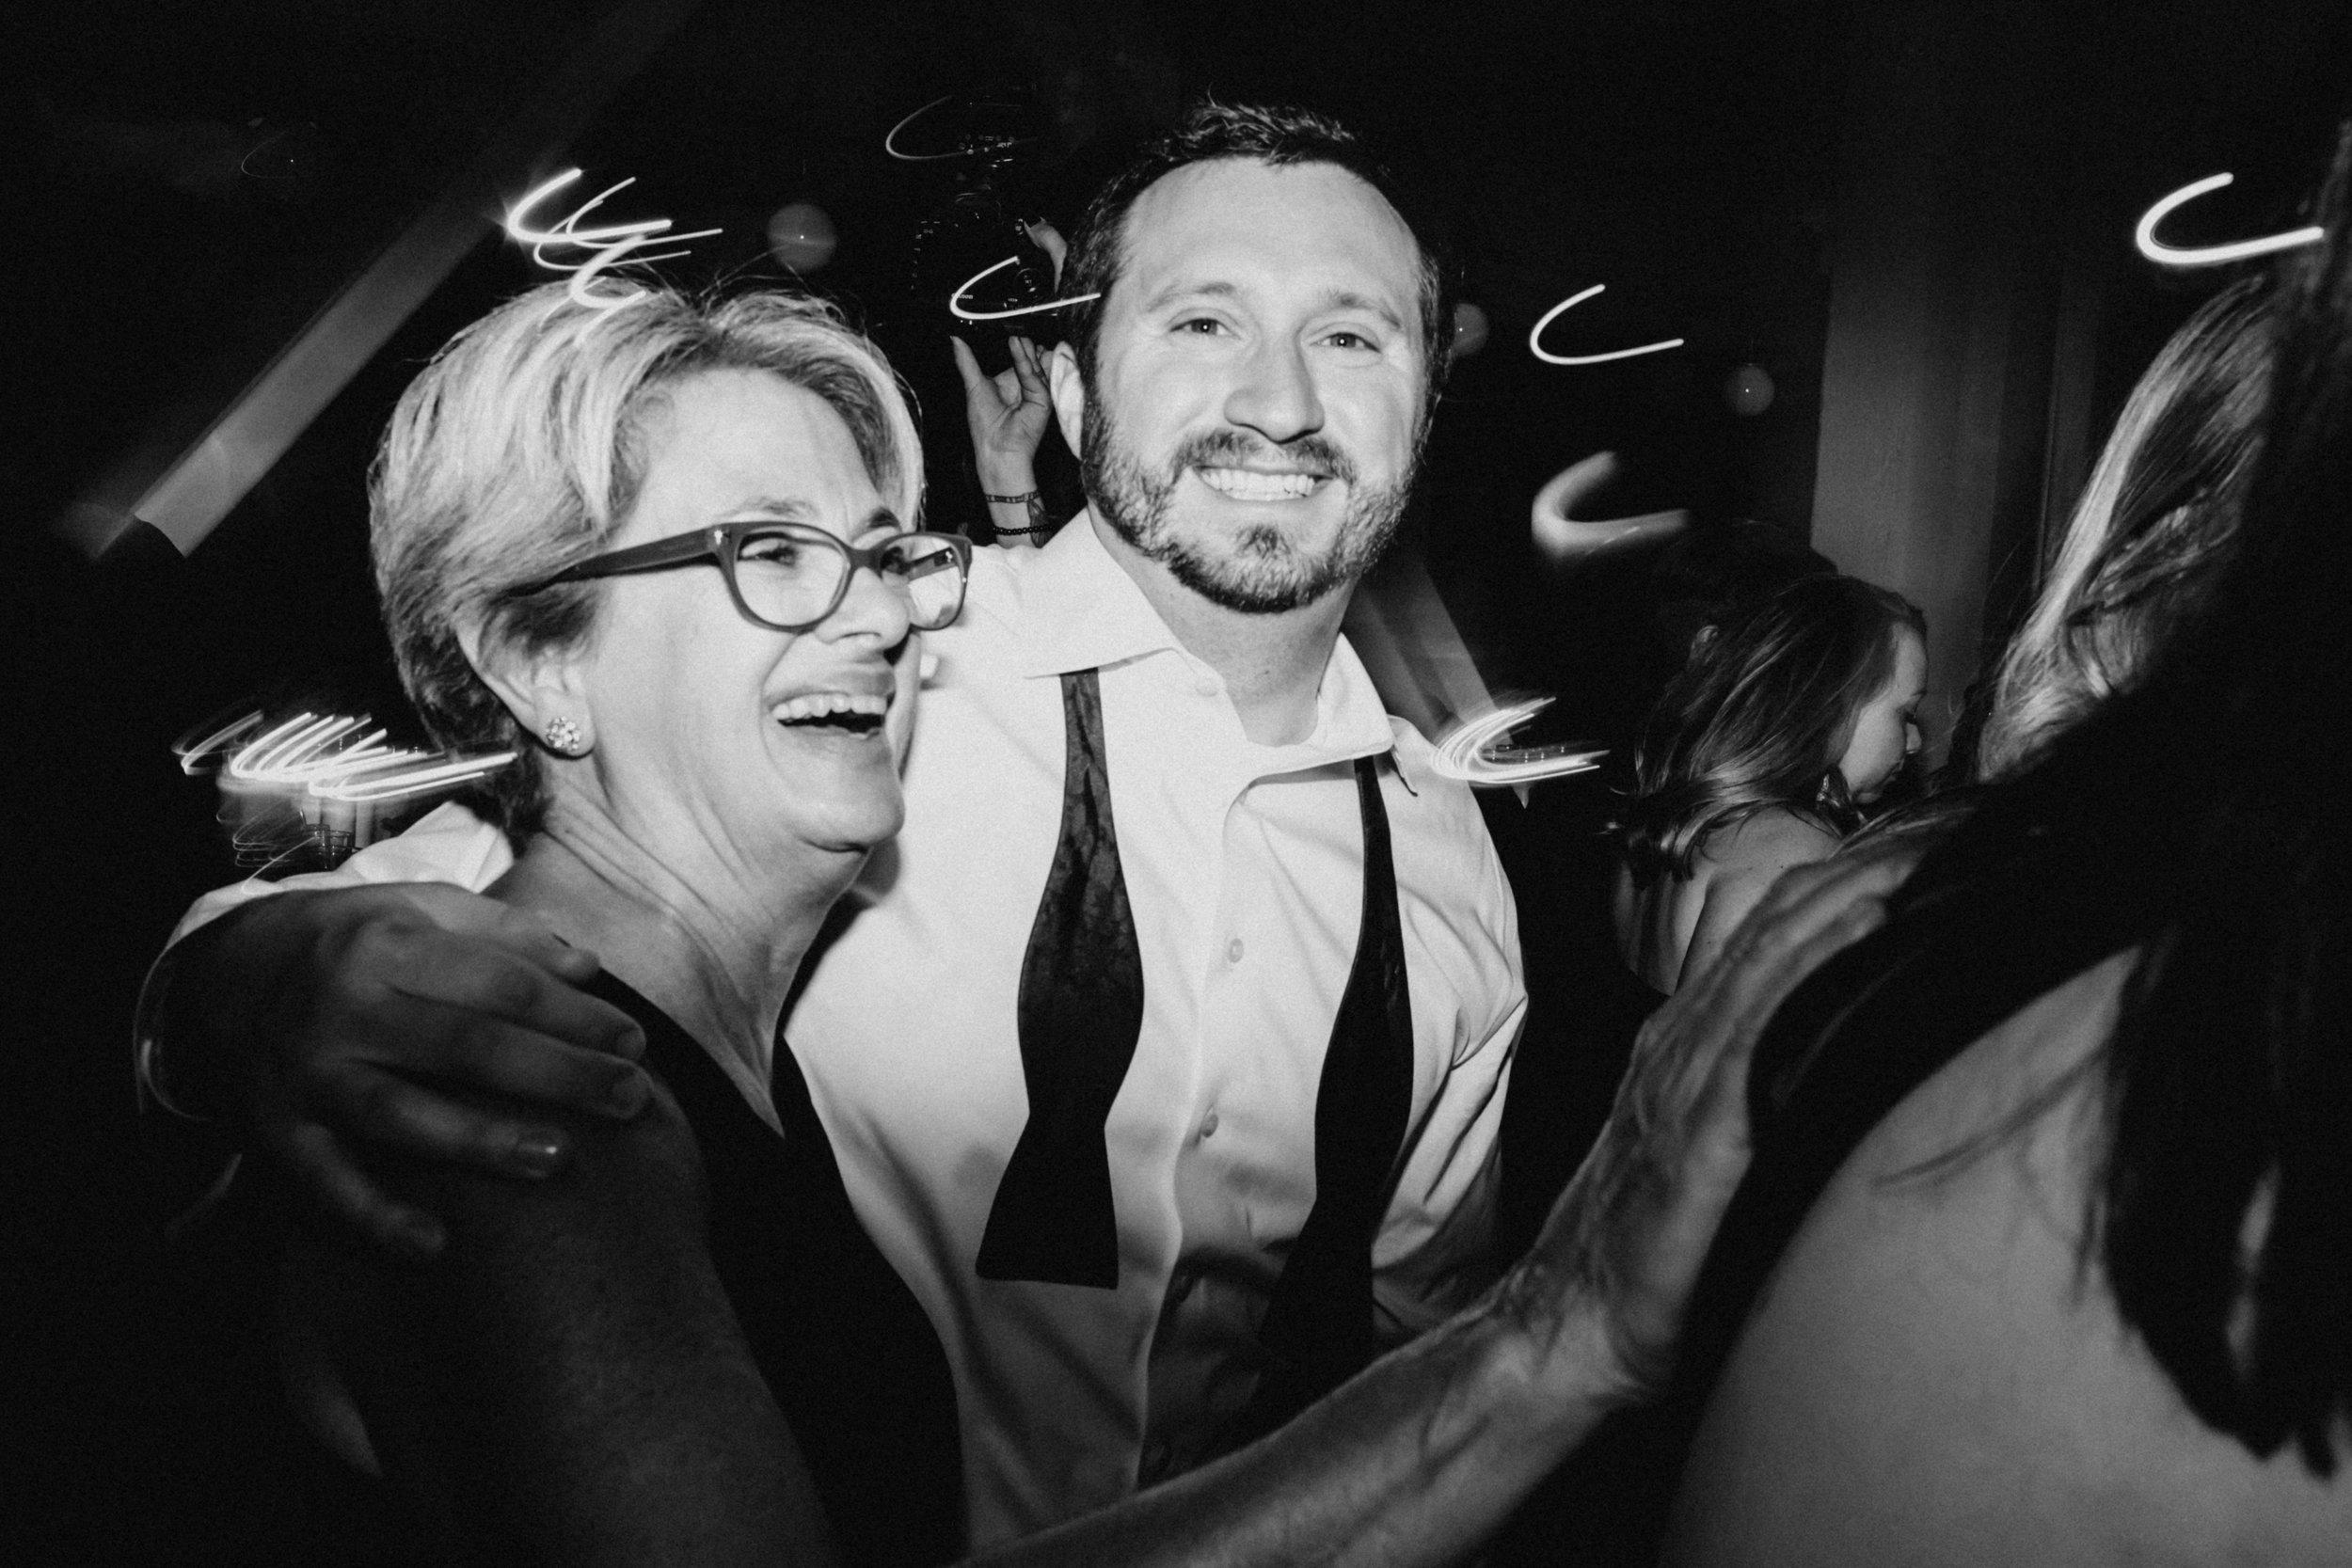 authentic wedding photography chicago illinois